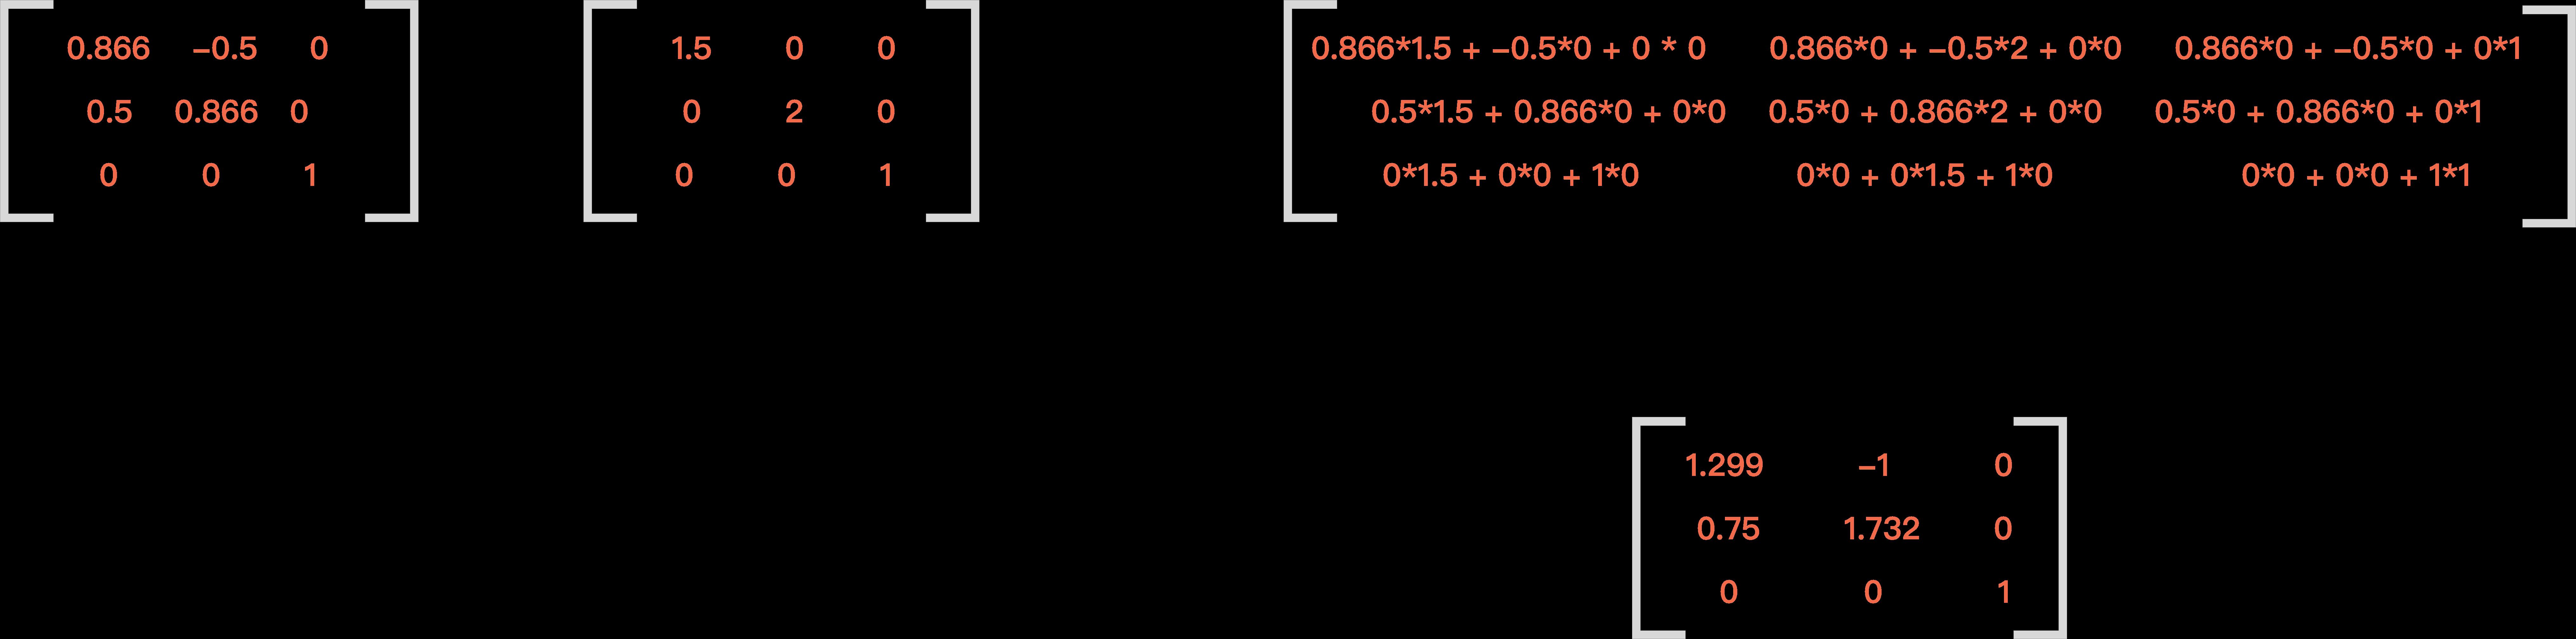 金沙棋牌官方平台 39